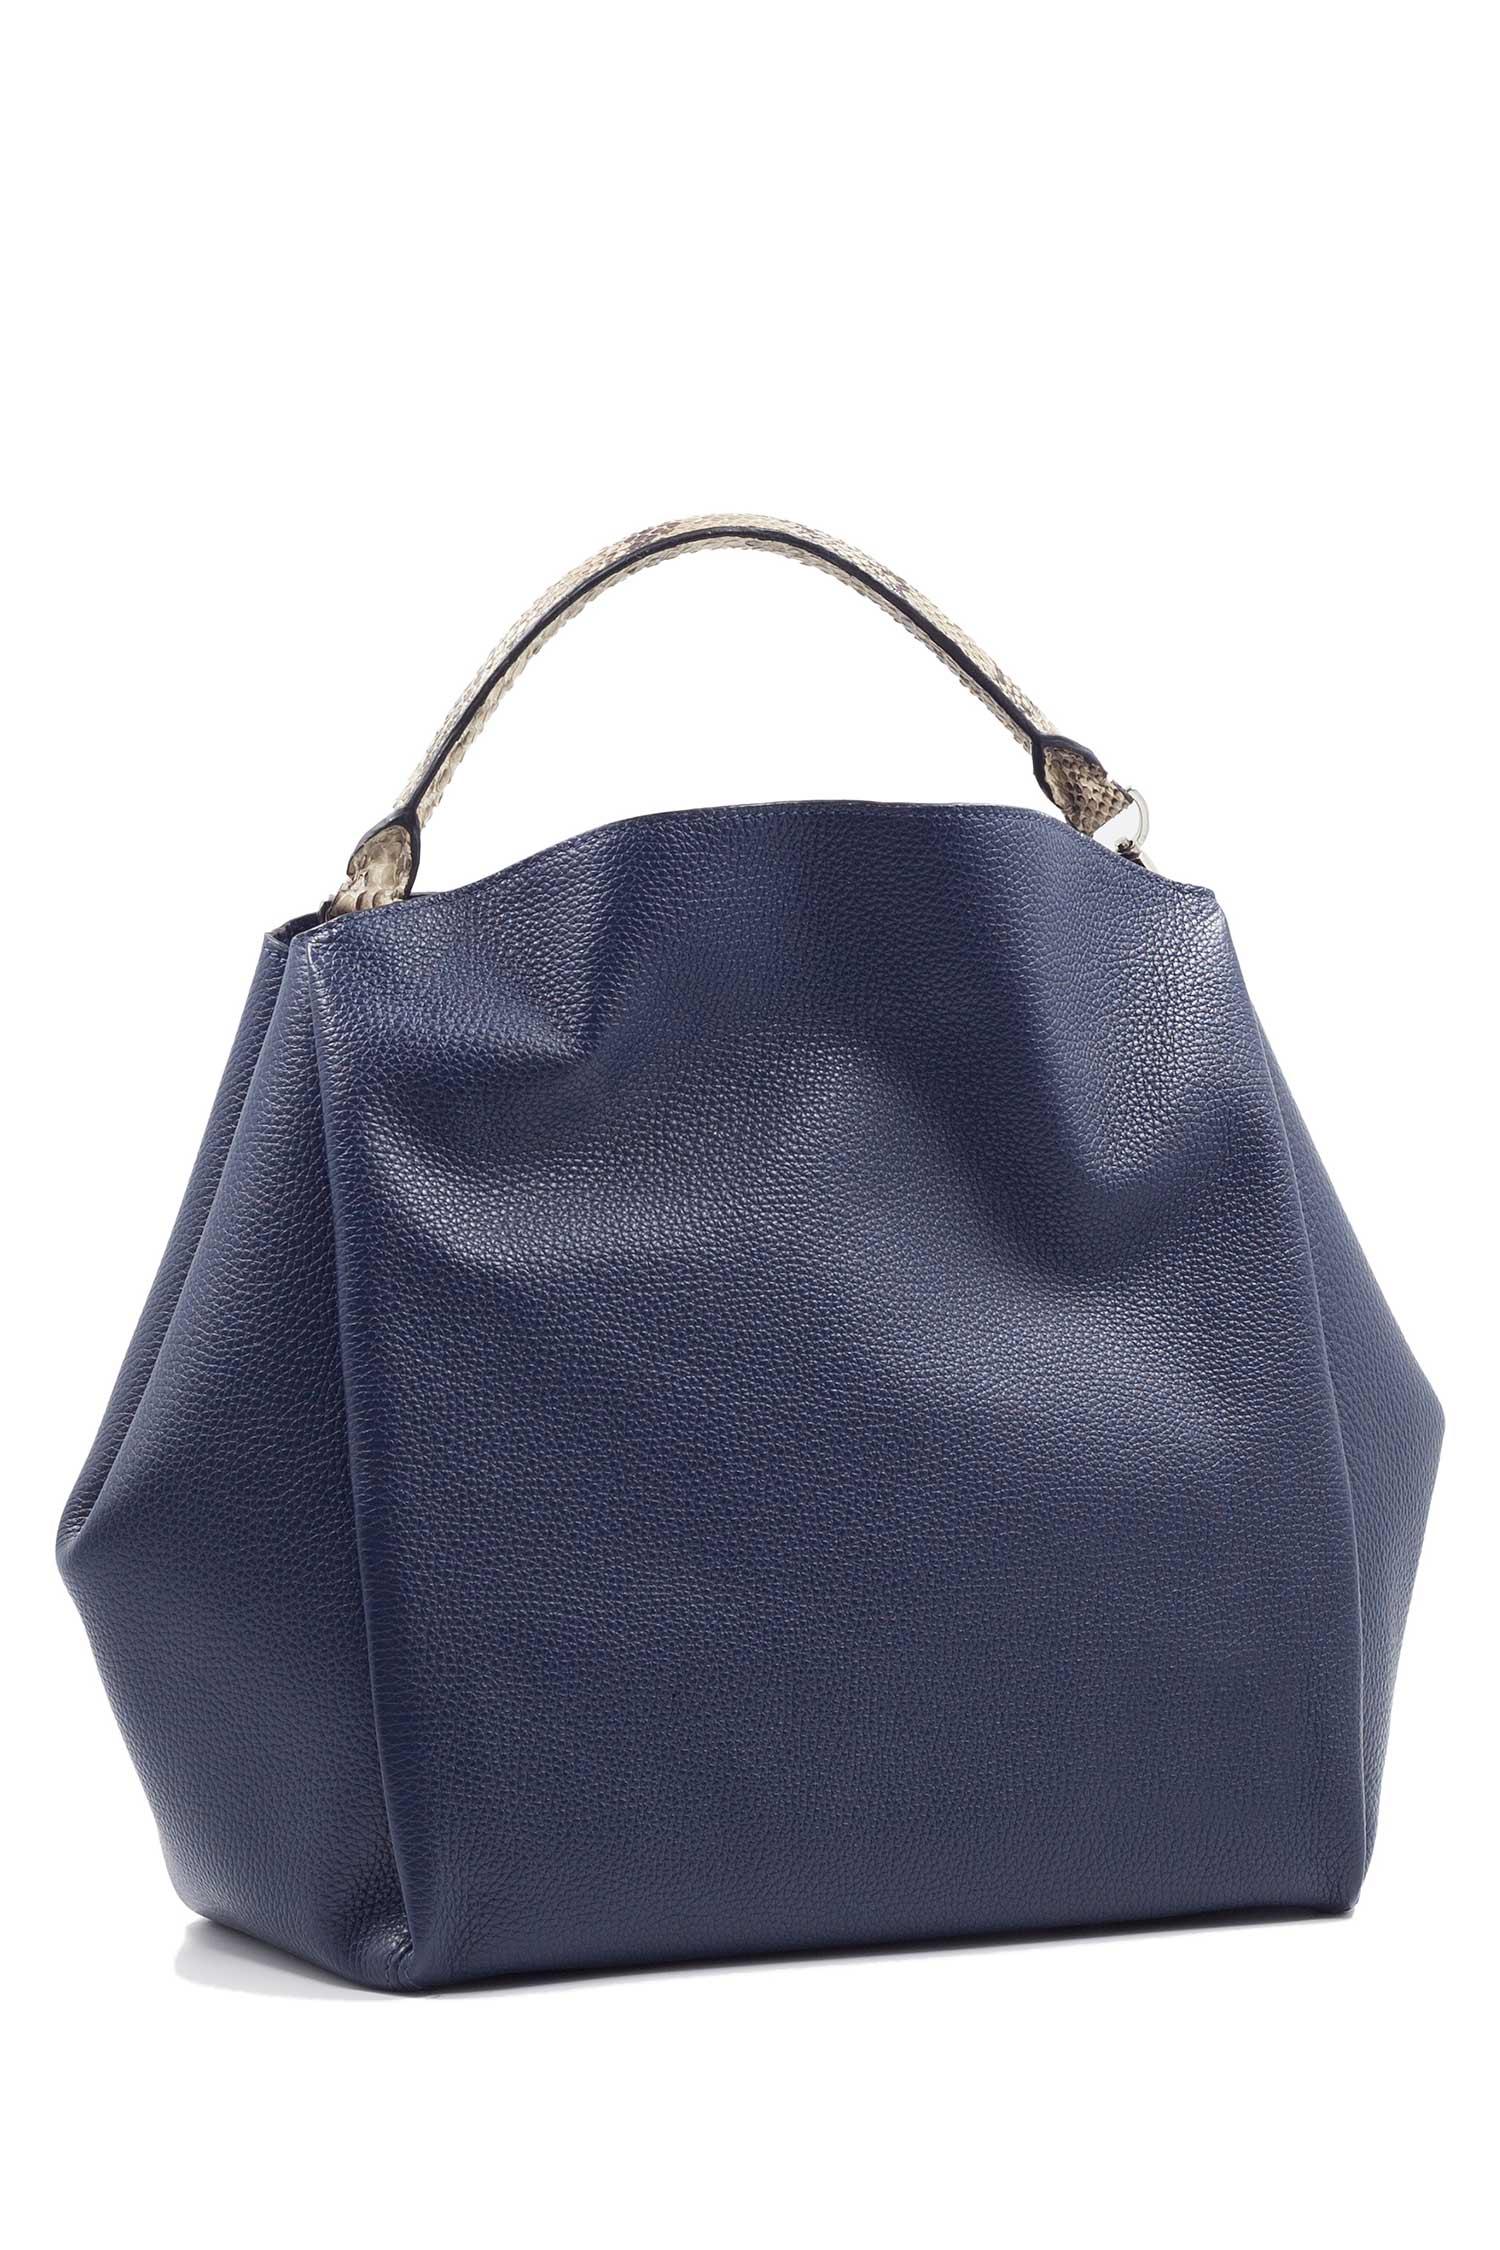 High Quality Luxury Unique Modern Cheap Woman Handbag